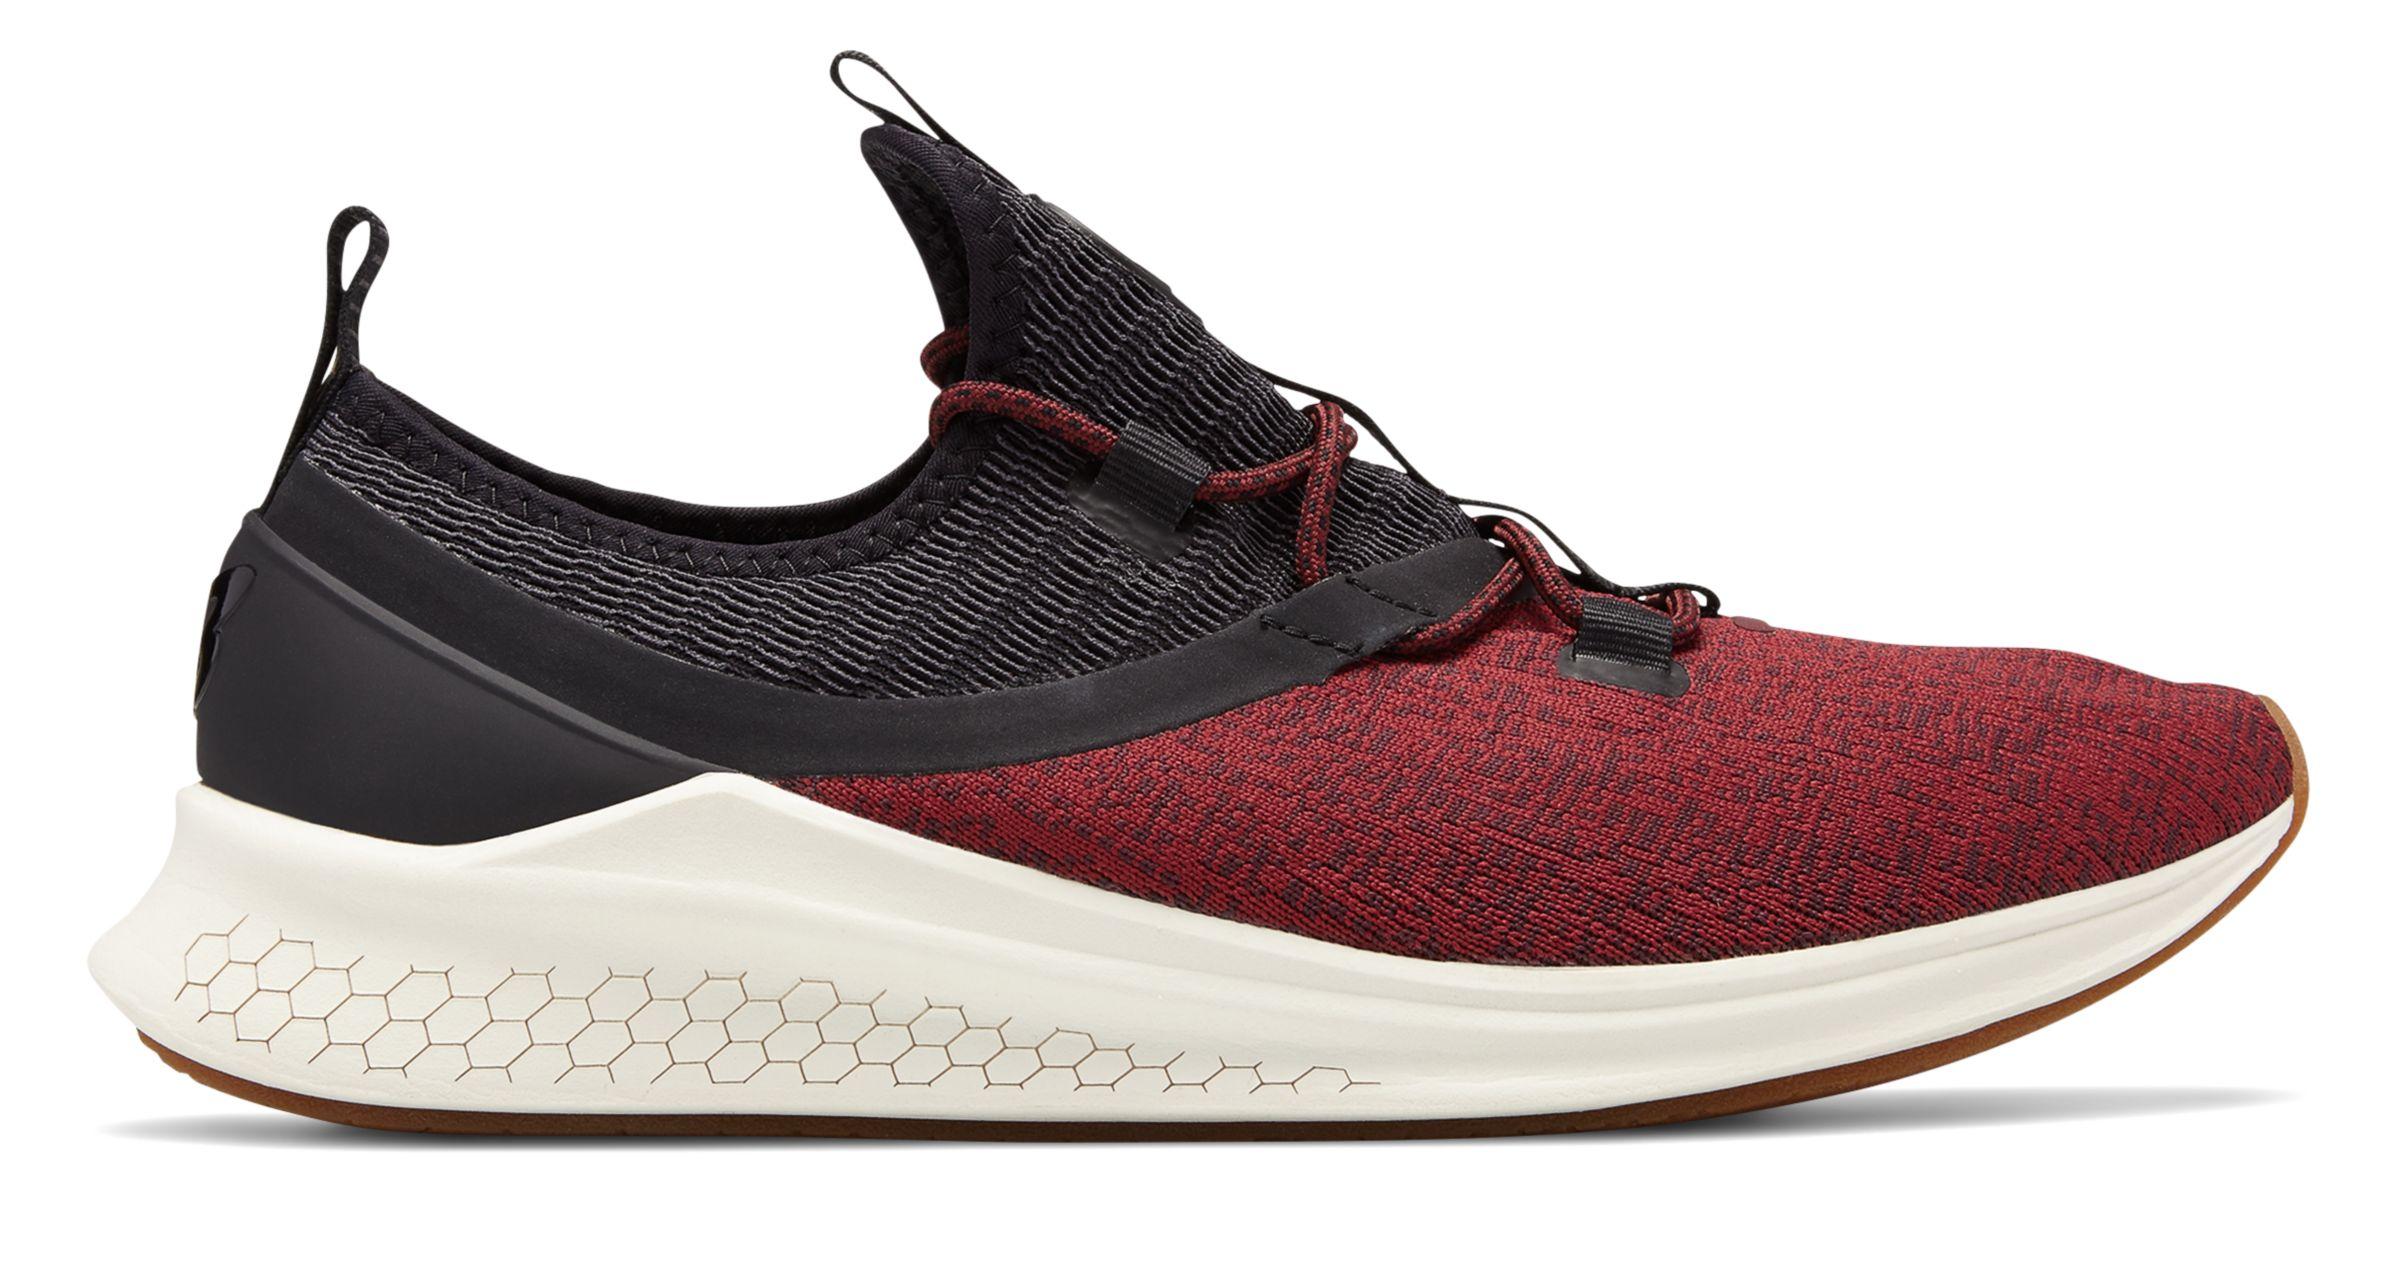 214c40f18da63 New Balance Men s Fresh Foam Lazr Sport Shoes Black with Red   Off ...